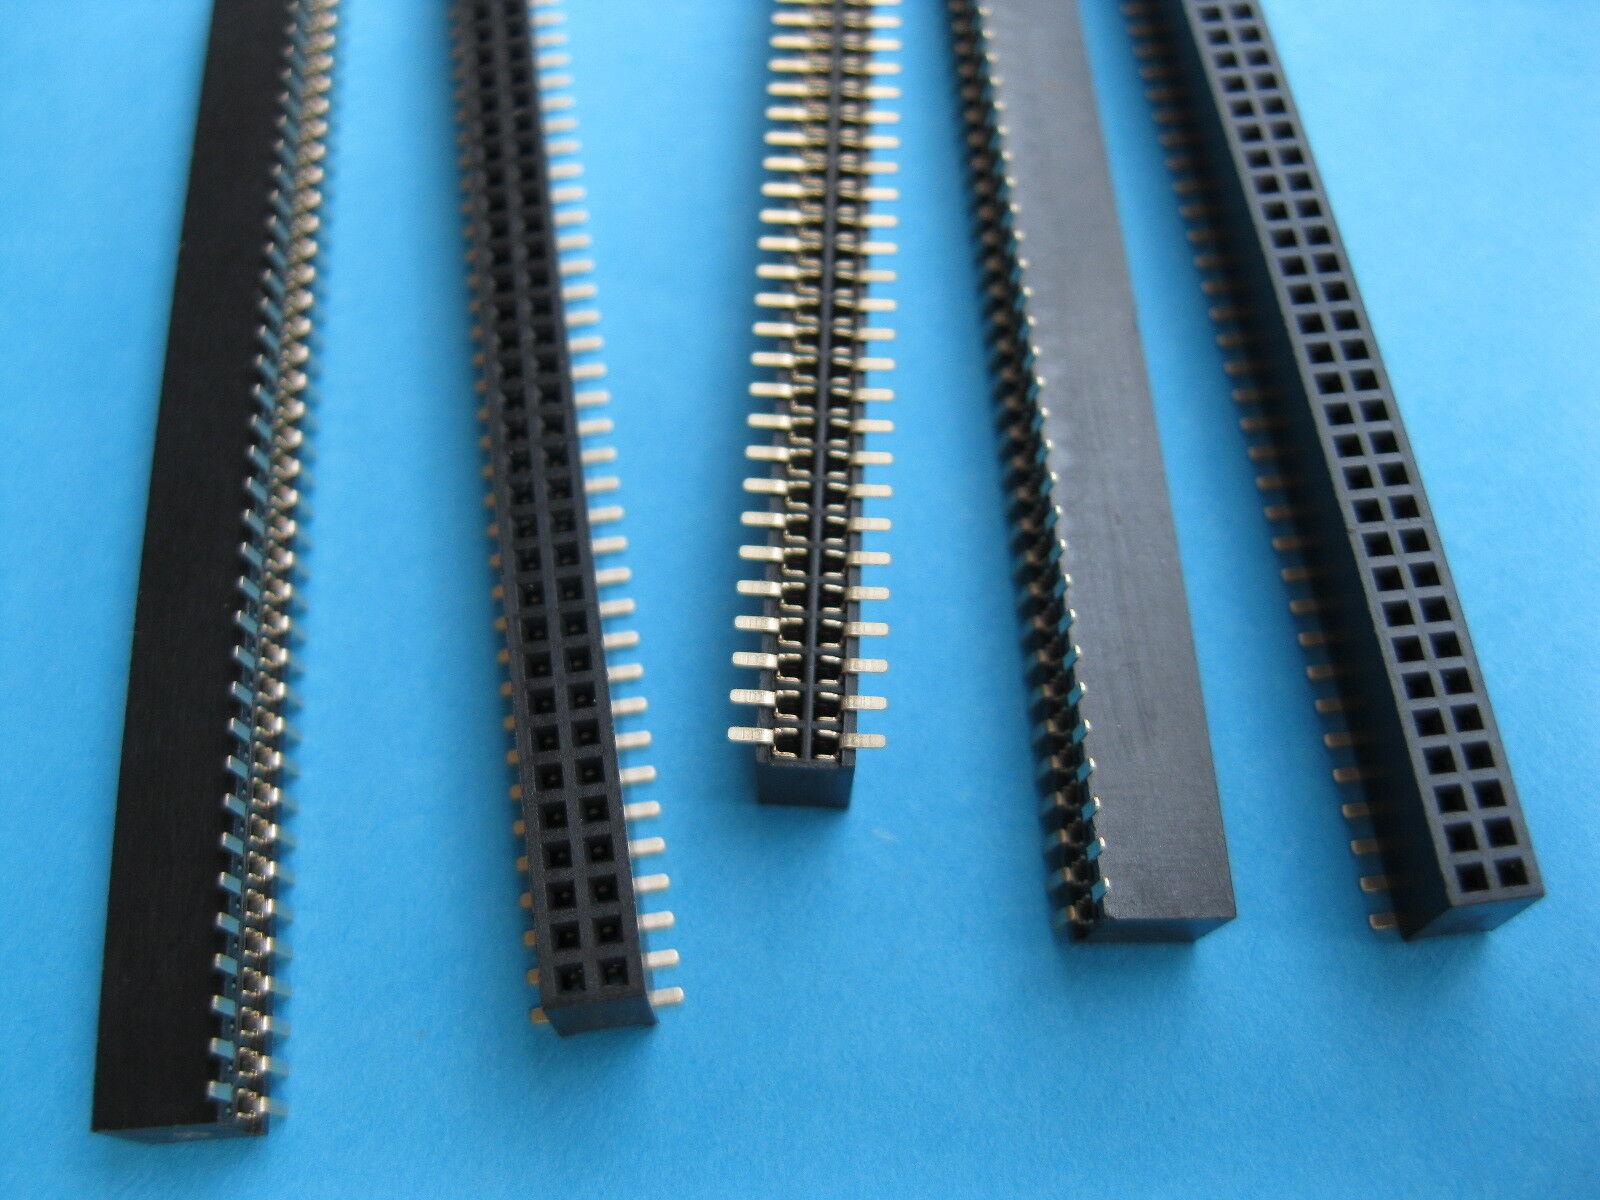 10pcs 40pin Strip Tin PCB Female IC Breakable Single Row Round Header Socket Uu